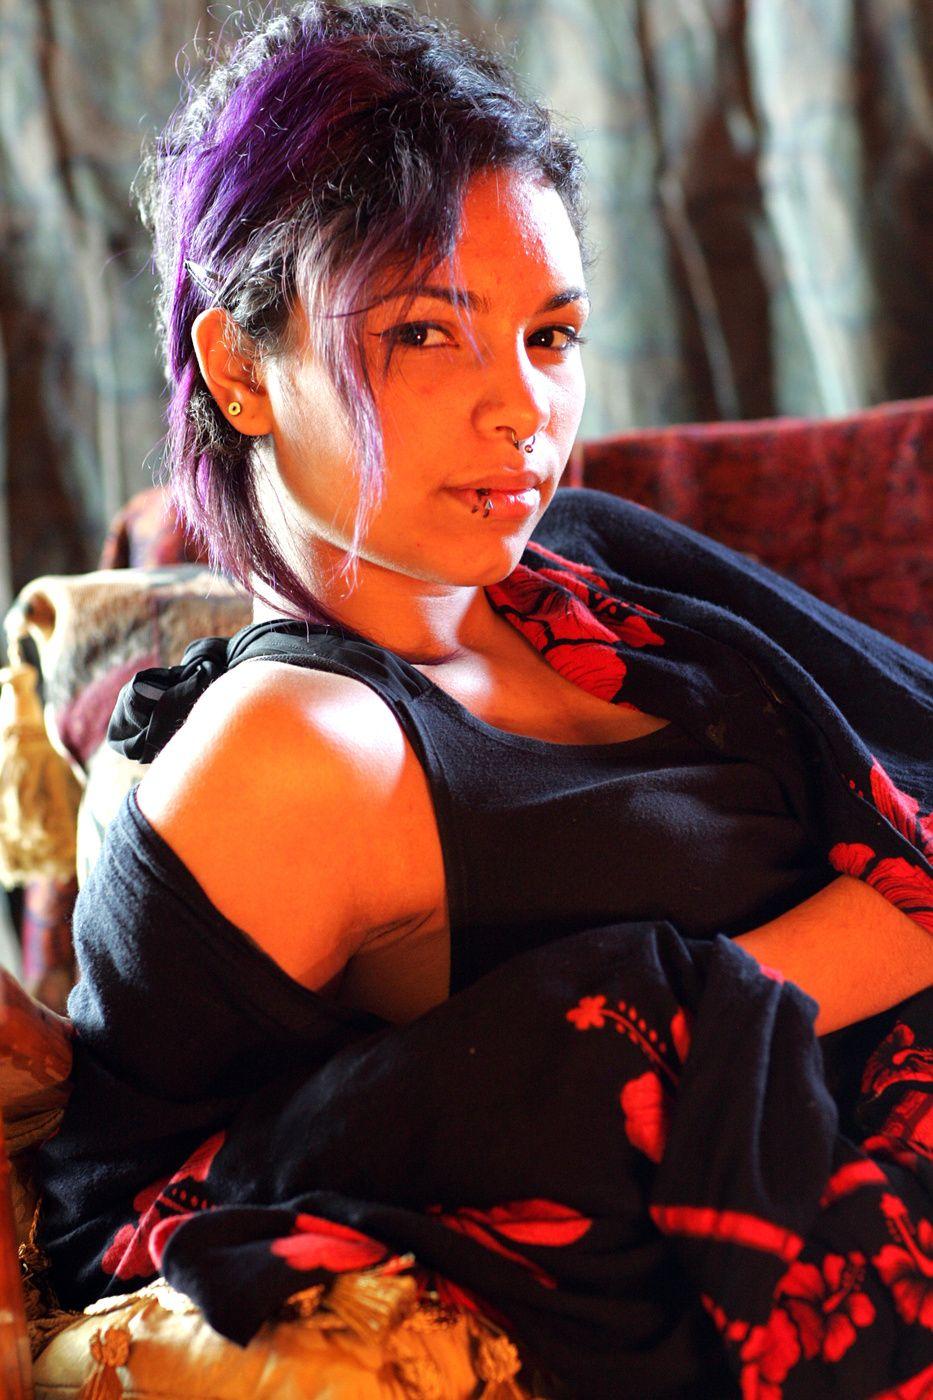 Young girl sex nn models